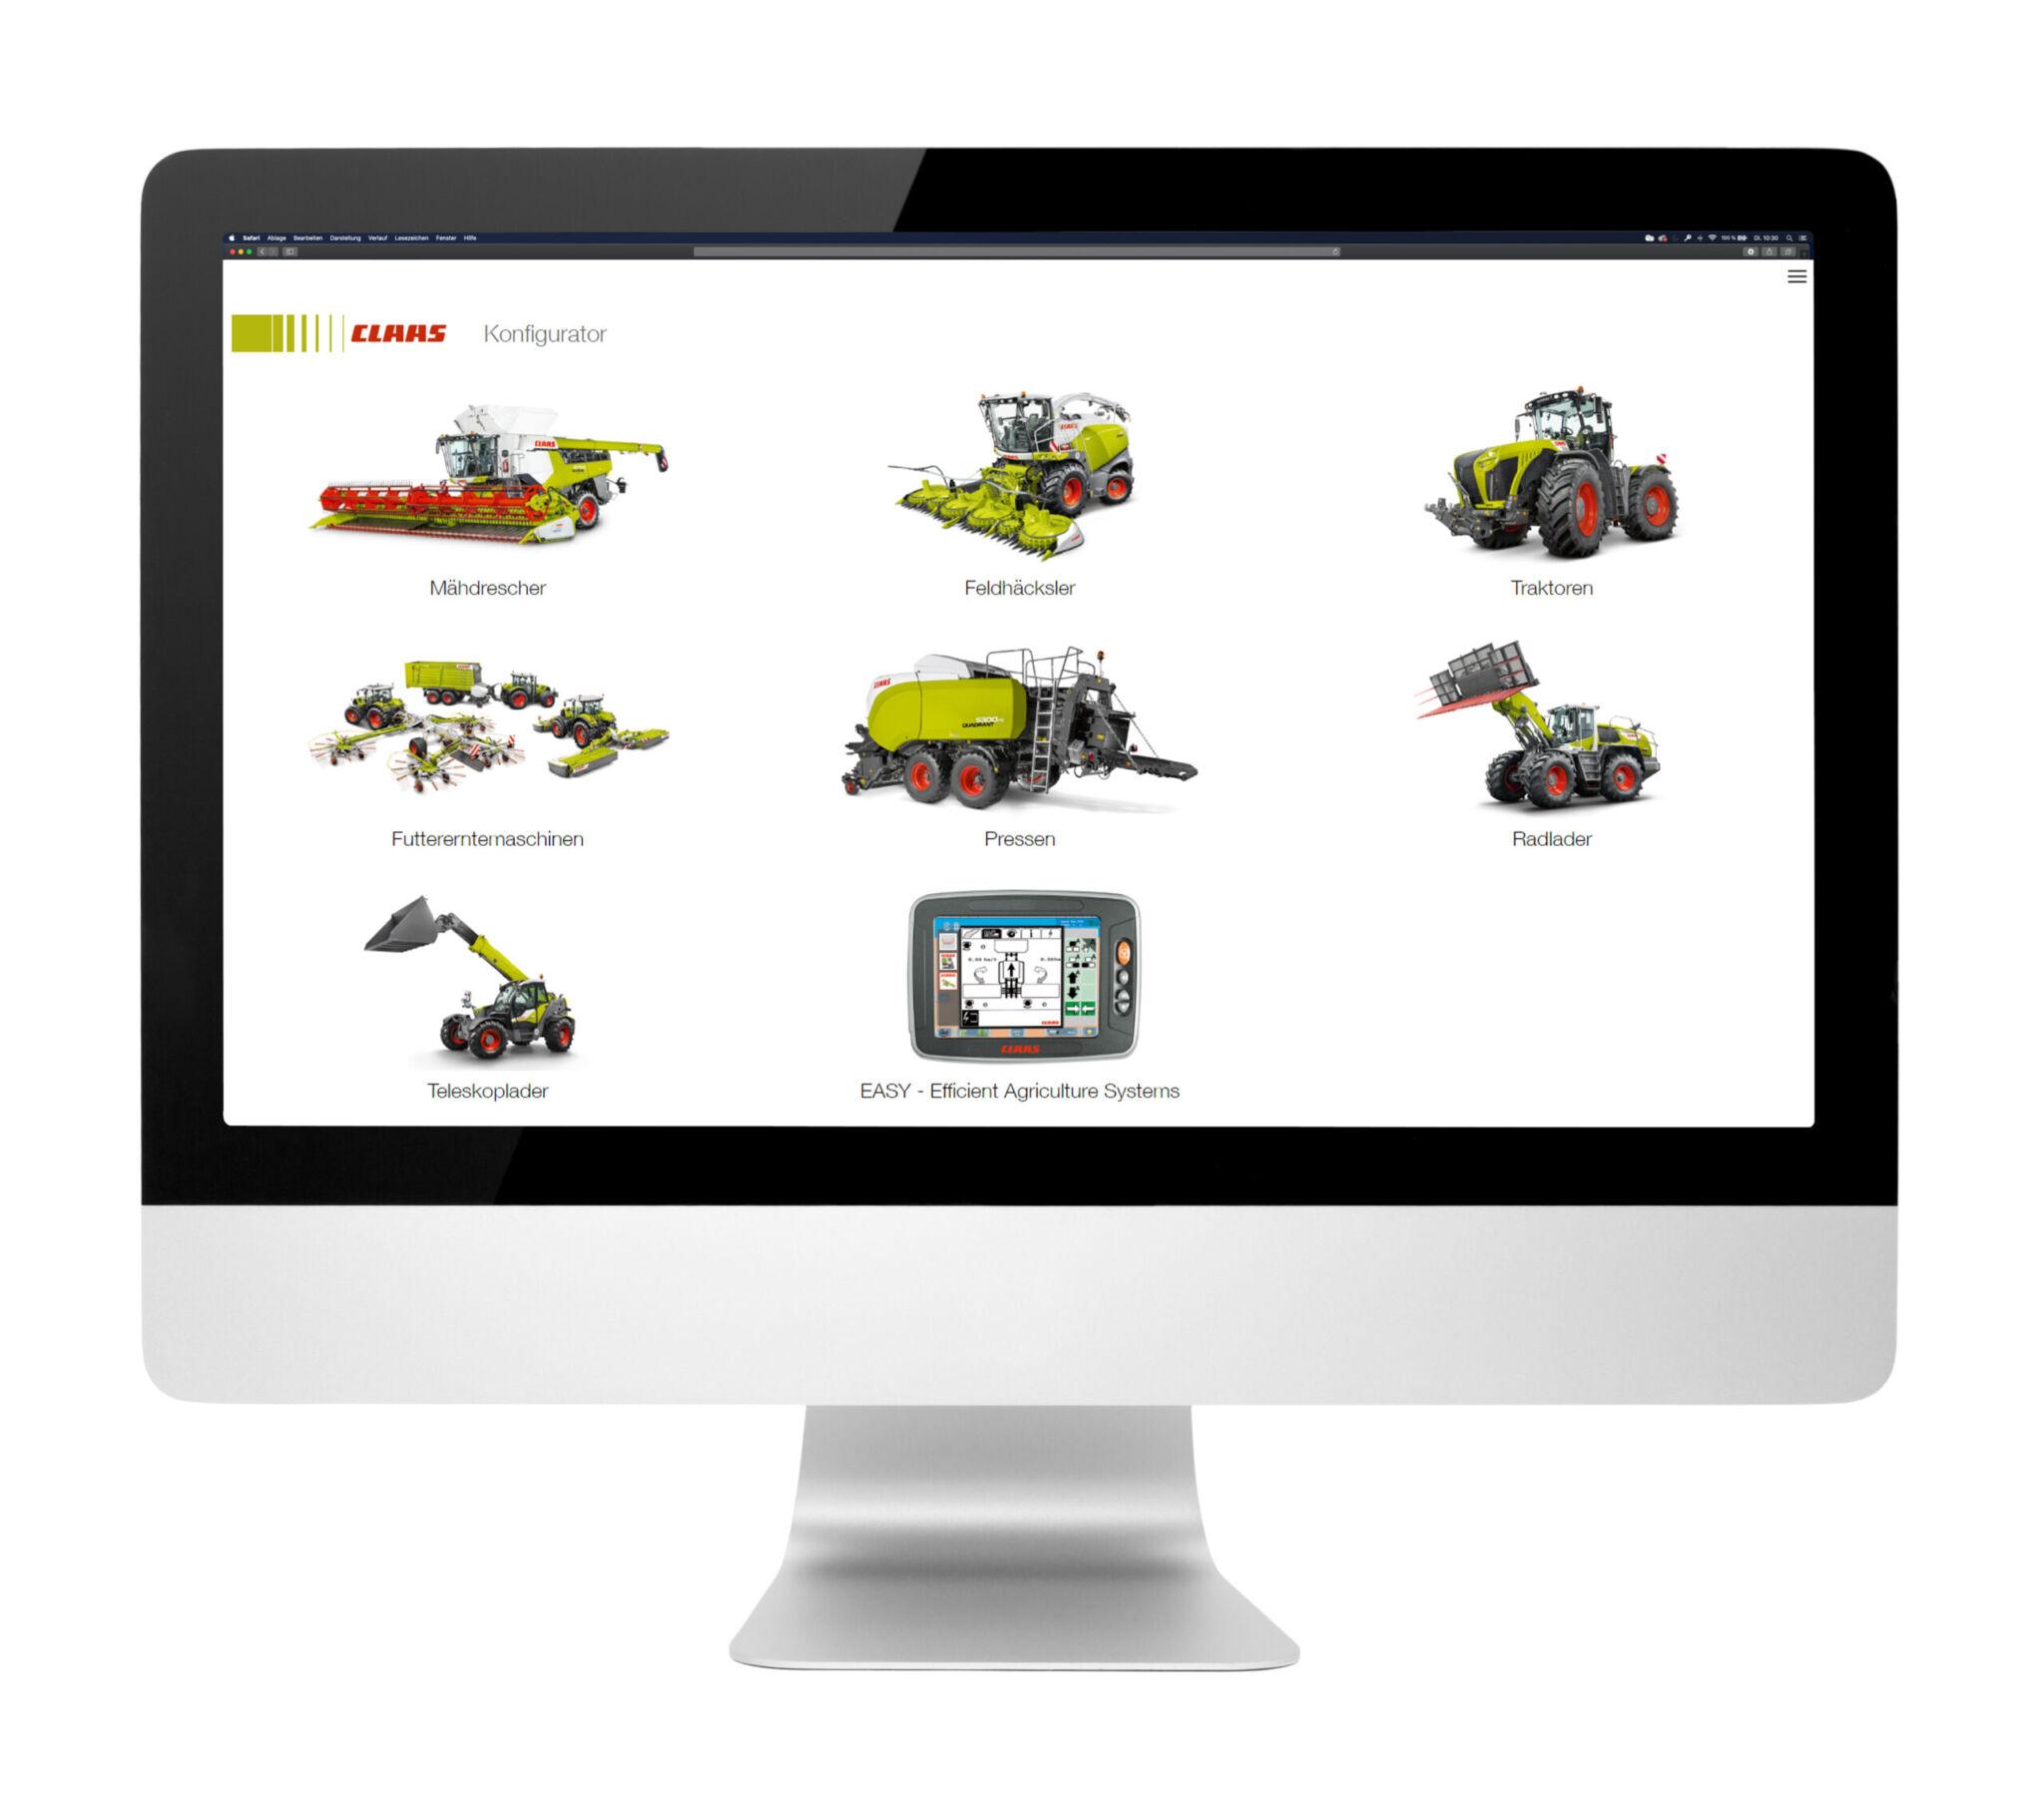 Claas Produktkonfigurator IMac|copyright: Werkbild